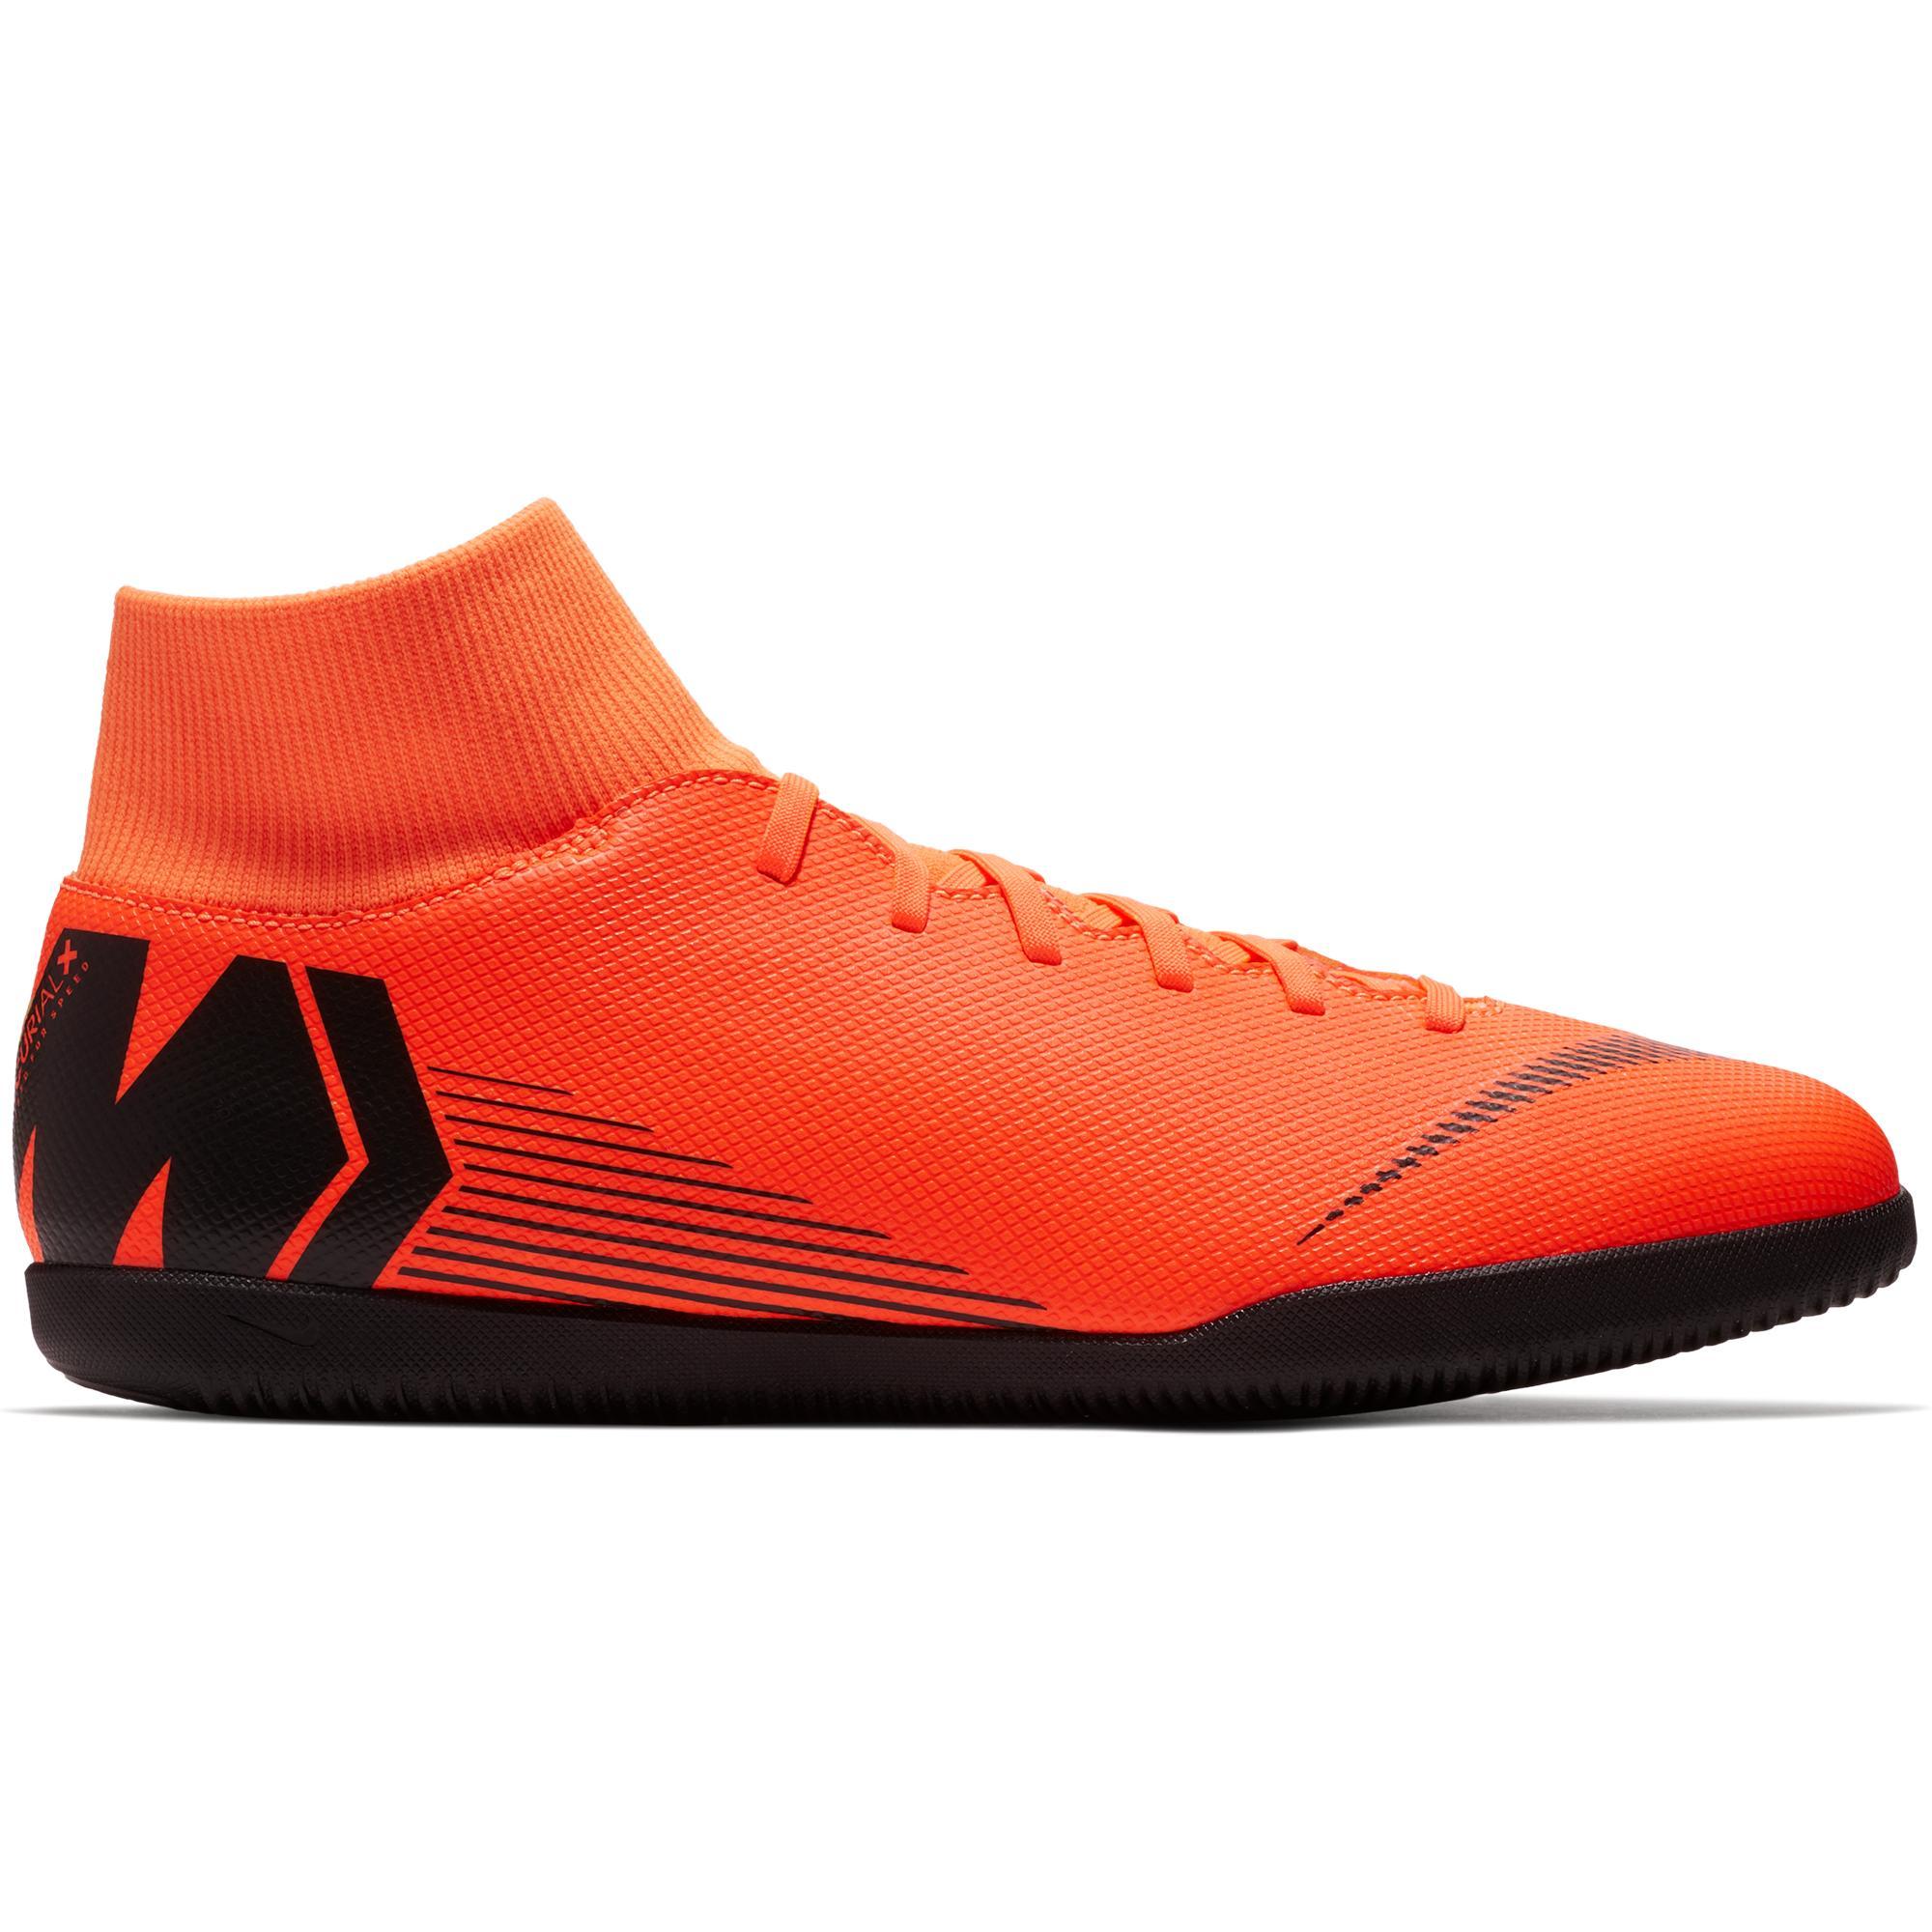 Nike Zaalvoetbalschoenen Mercurial Superfly X Club sala